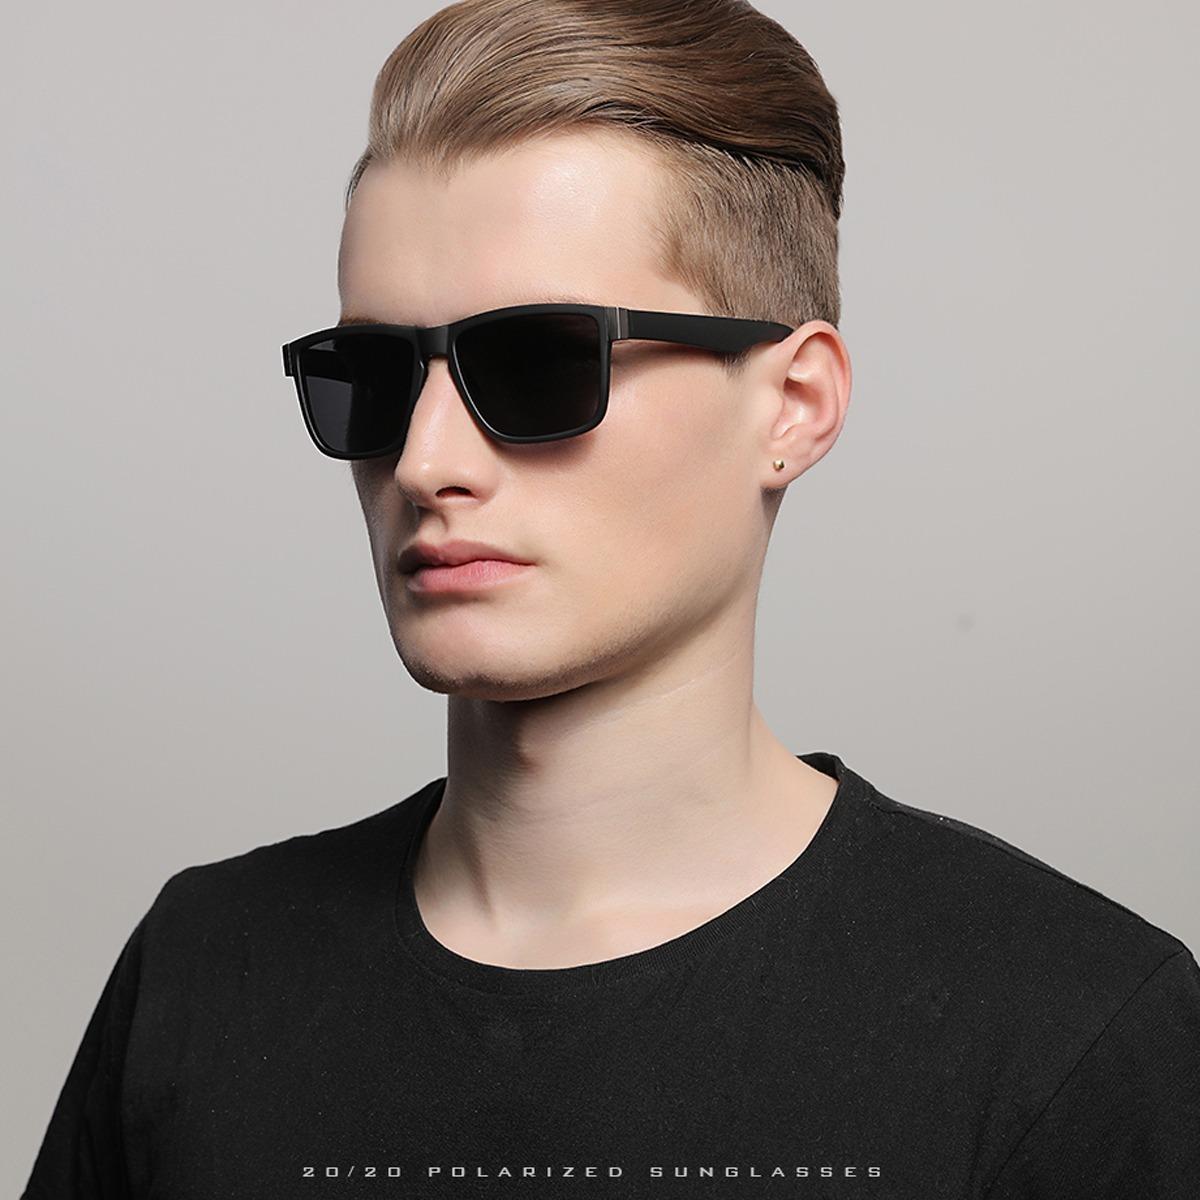 c2ab09b08 Óculos Sol Feminino Espelhado 2020 Vintage Oculos Masculino - R$ 87 ...